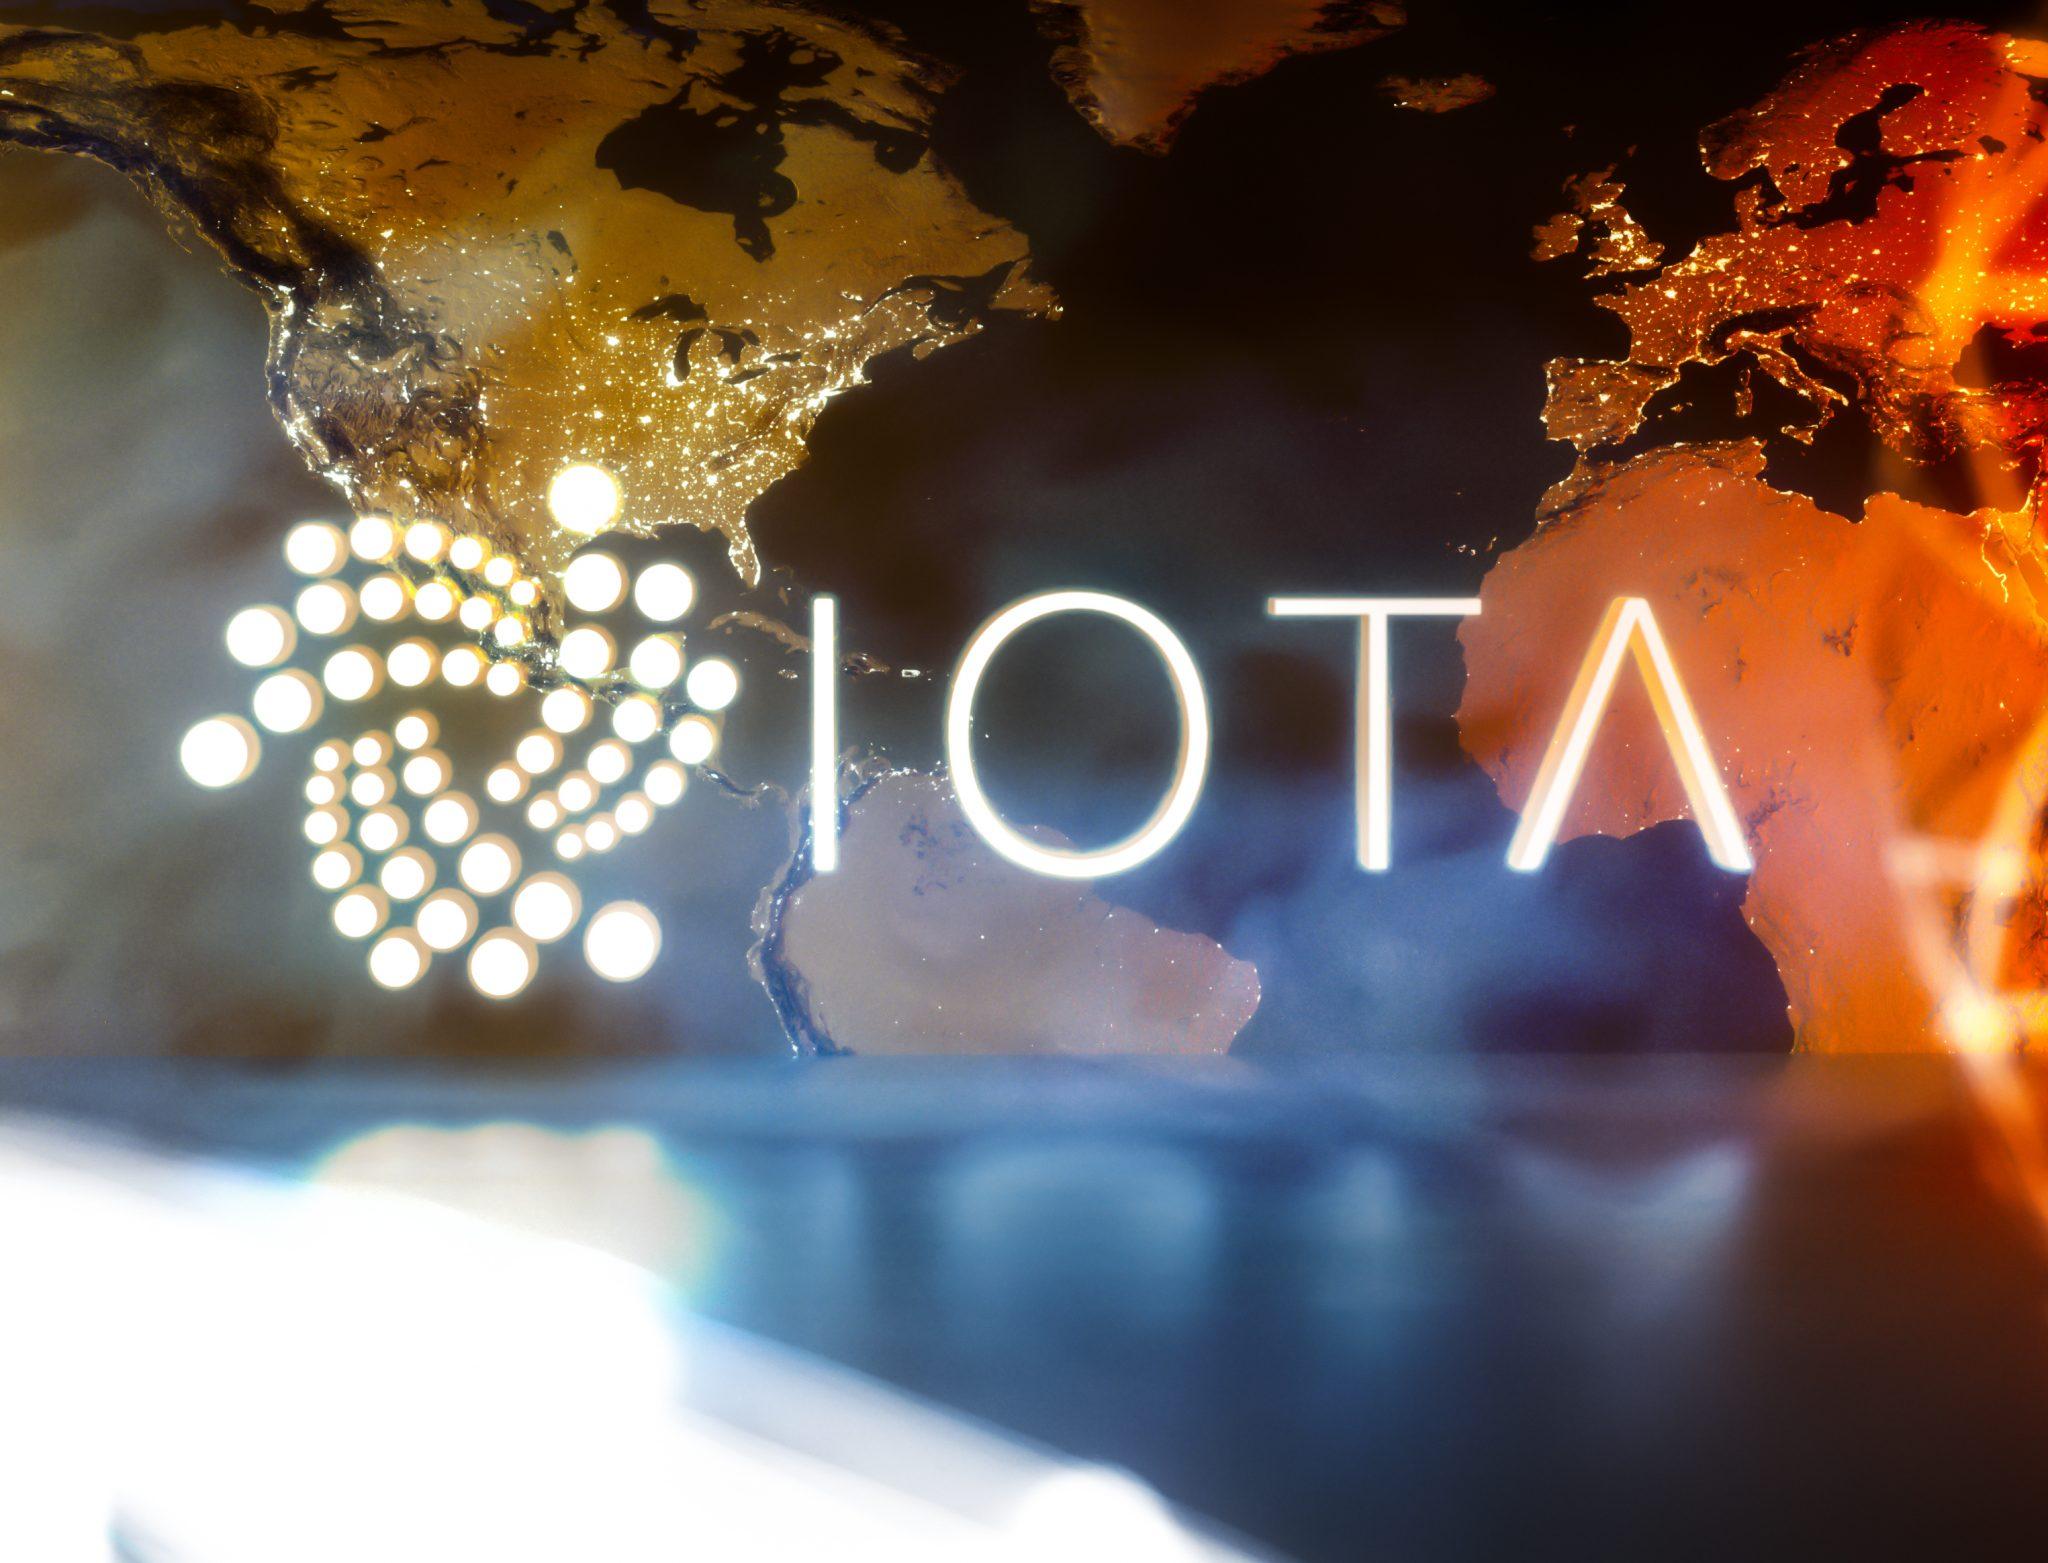 IOTA cryptocurrency with worldmap